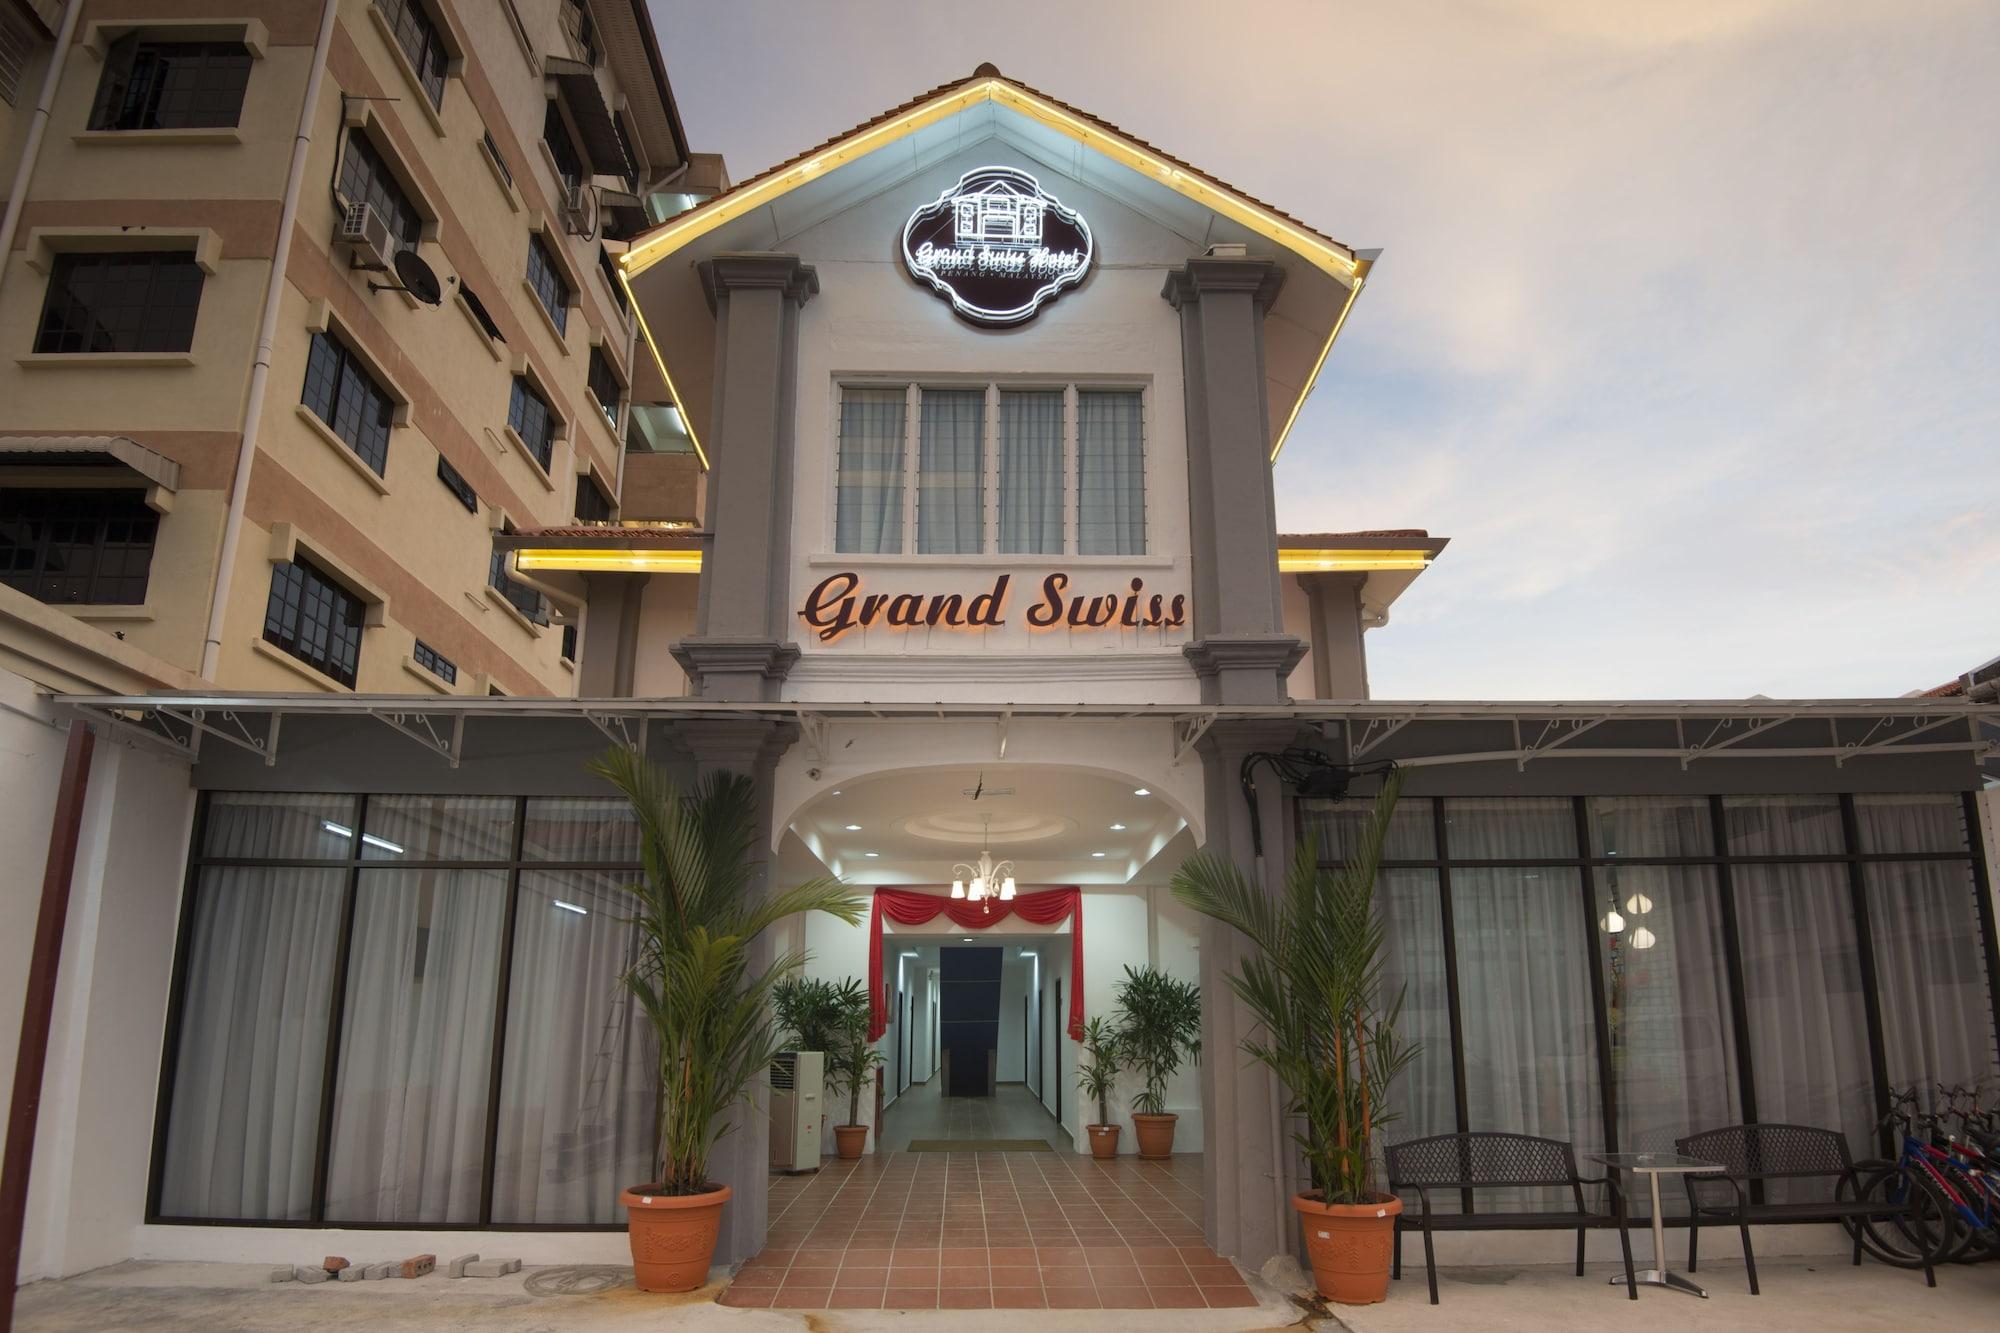 Grand Swiss Hotel @ Lebuh Chulia, Penang Island